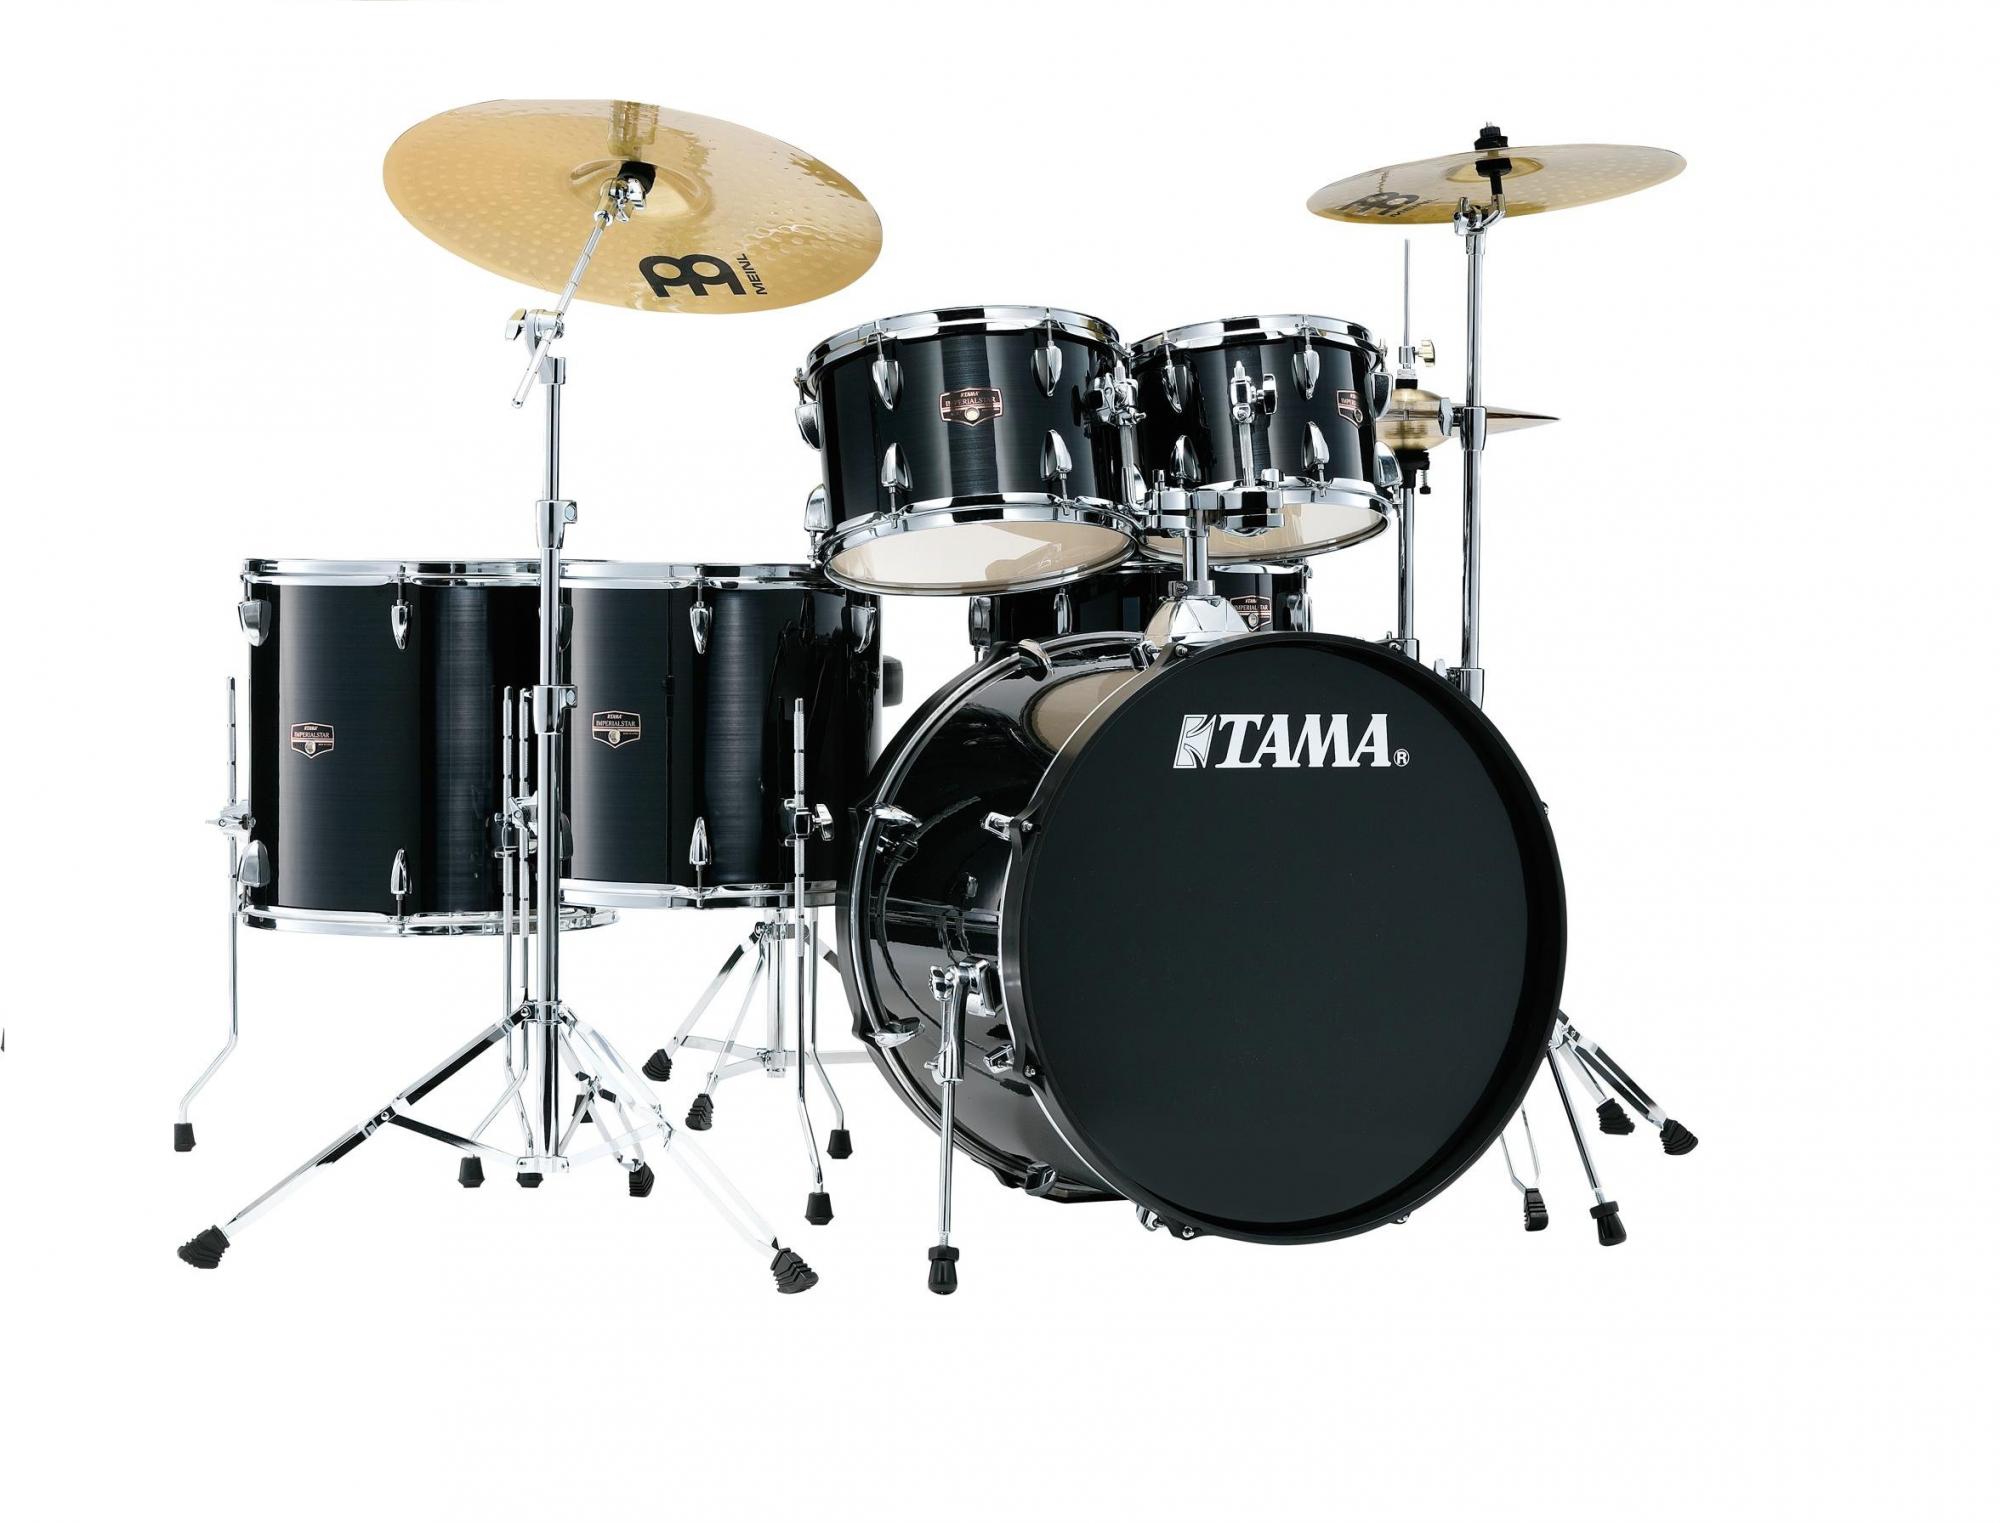 Tama Imperialstar Drum Kit, Hairline Black, 6 Piece